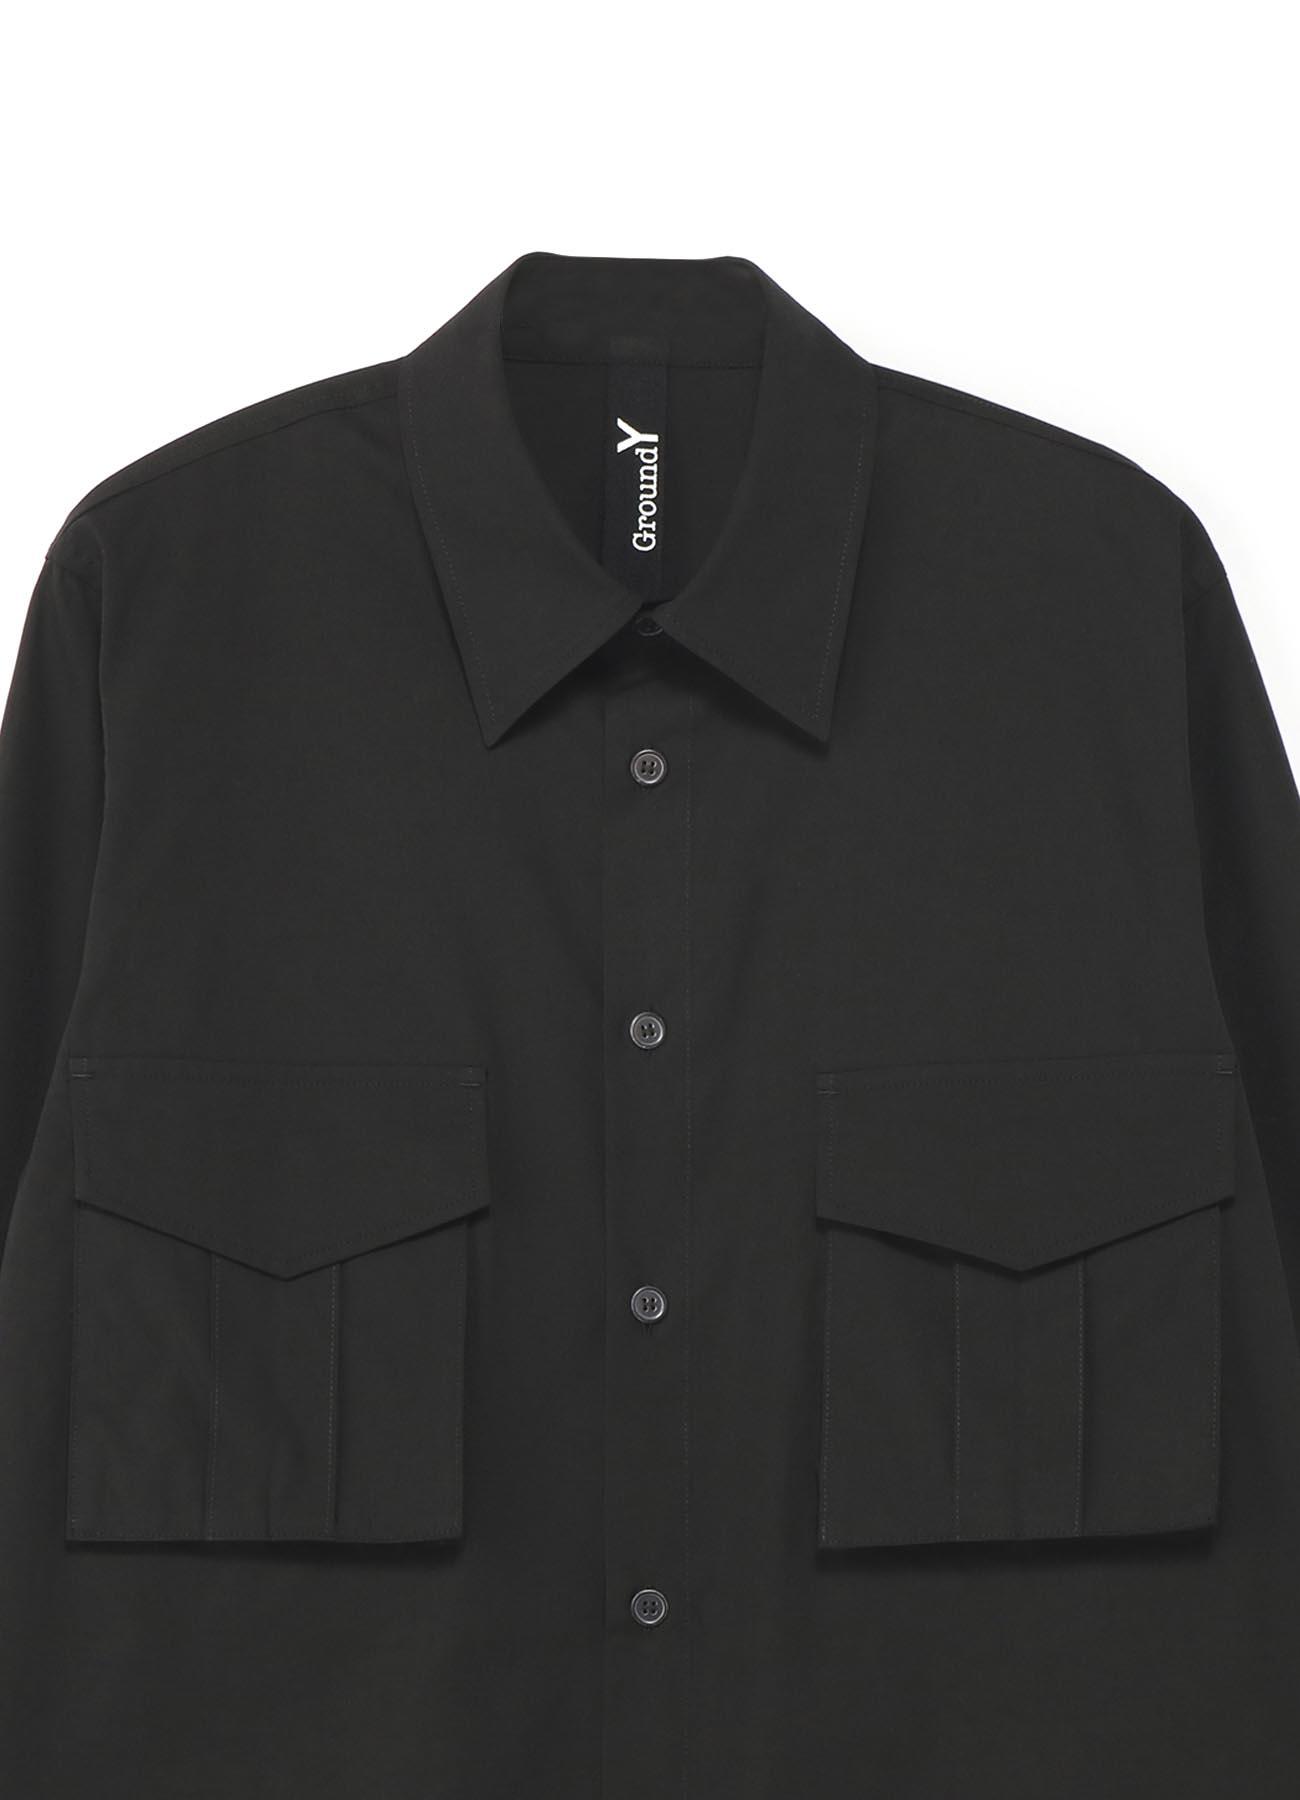 100/2 Cotton Broad Flap Pocket Shirt